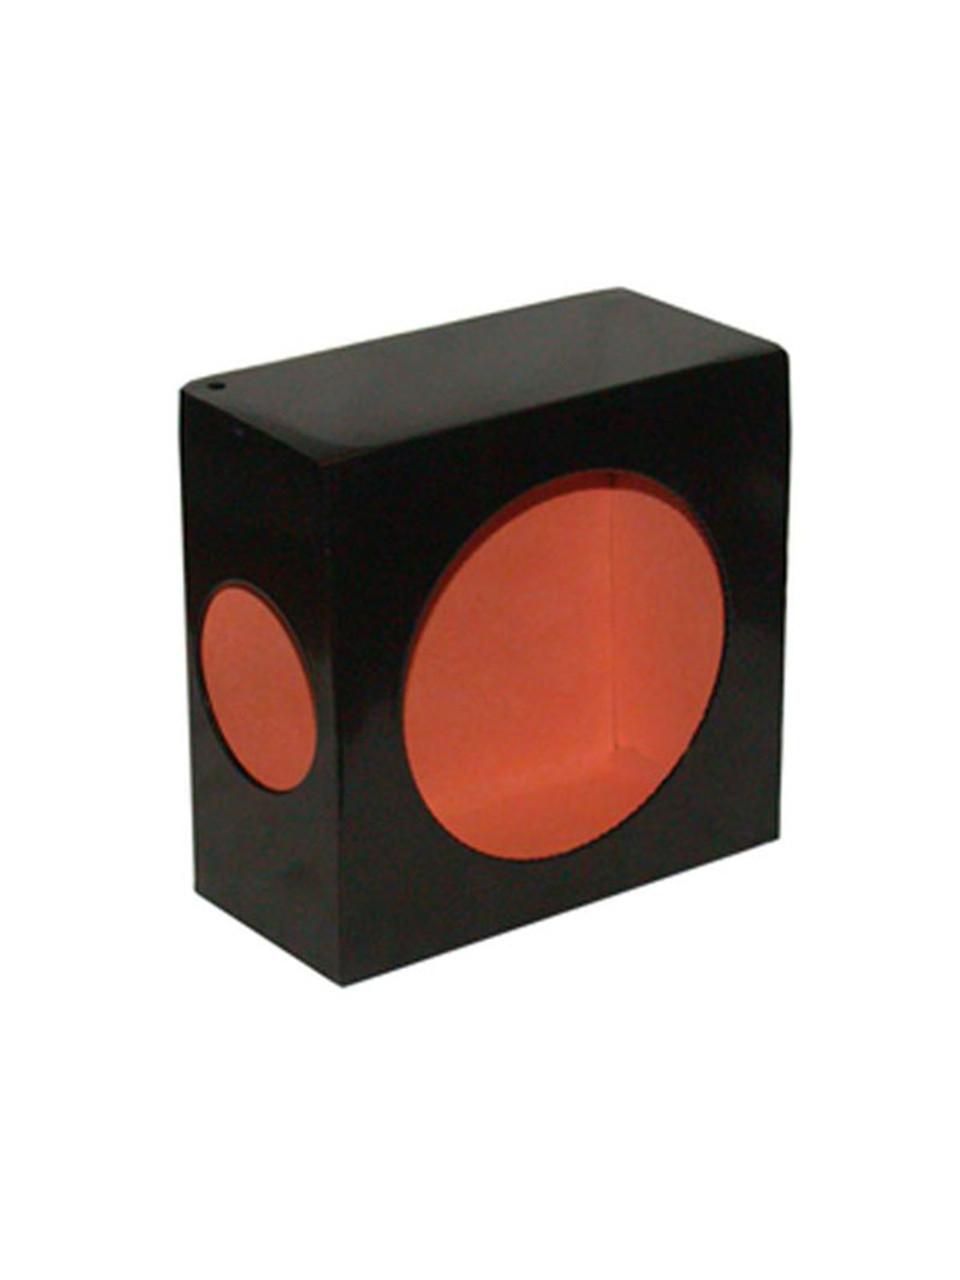 LB663SL --- Black Round Tail Light Guard Box  with Side Light